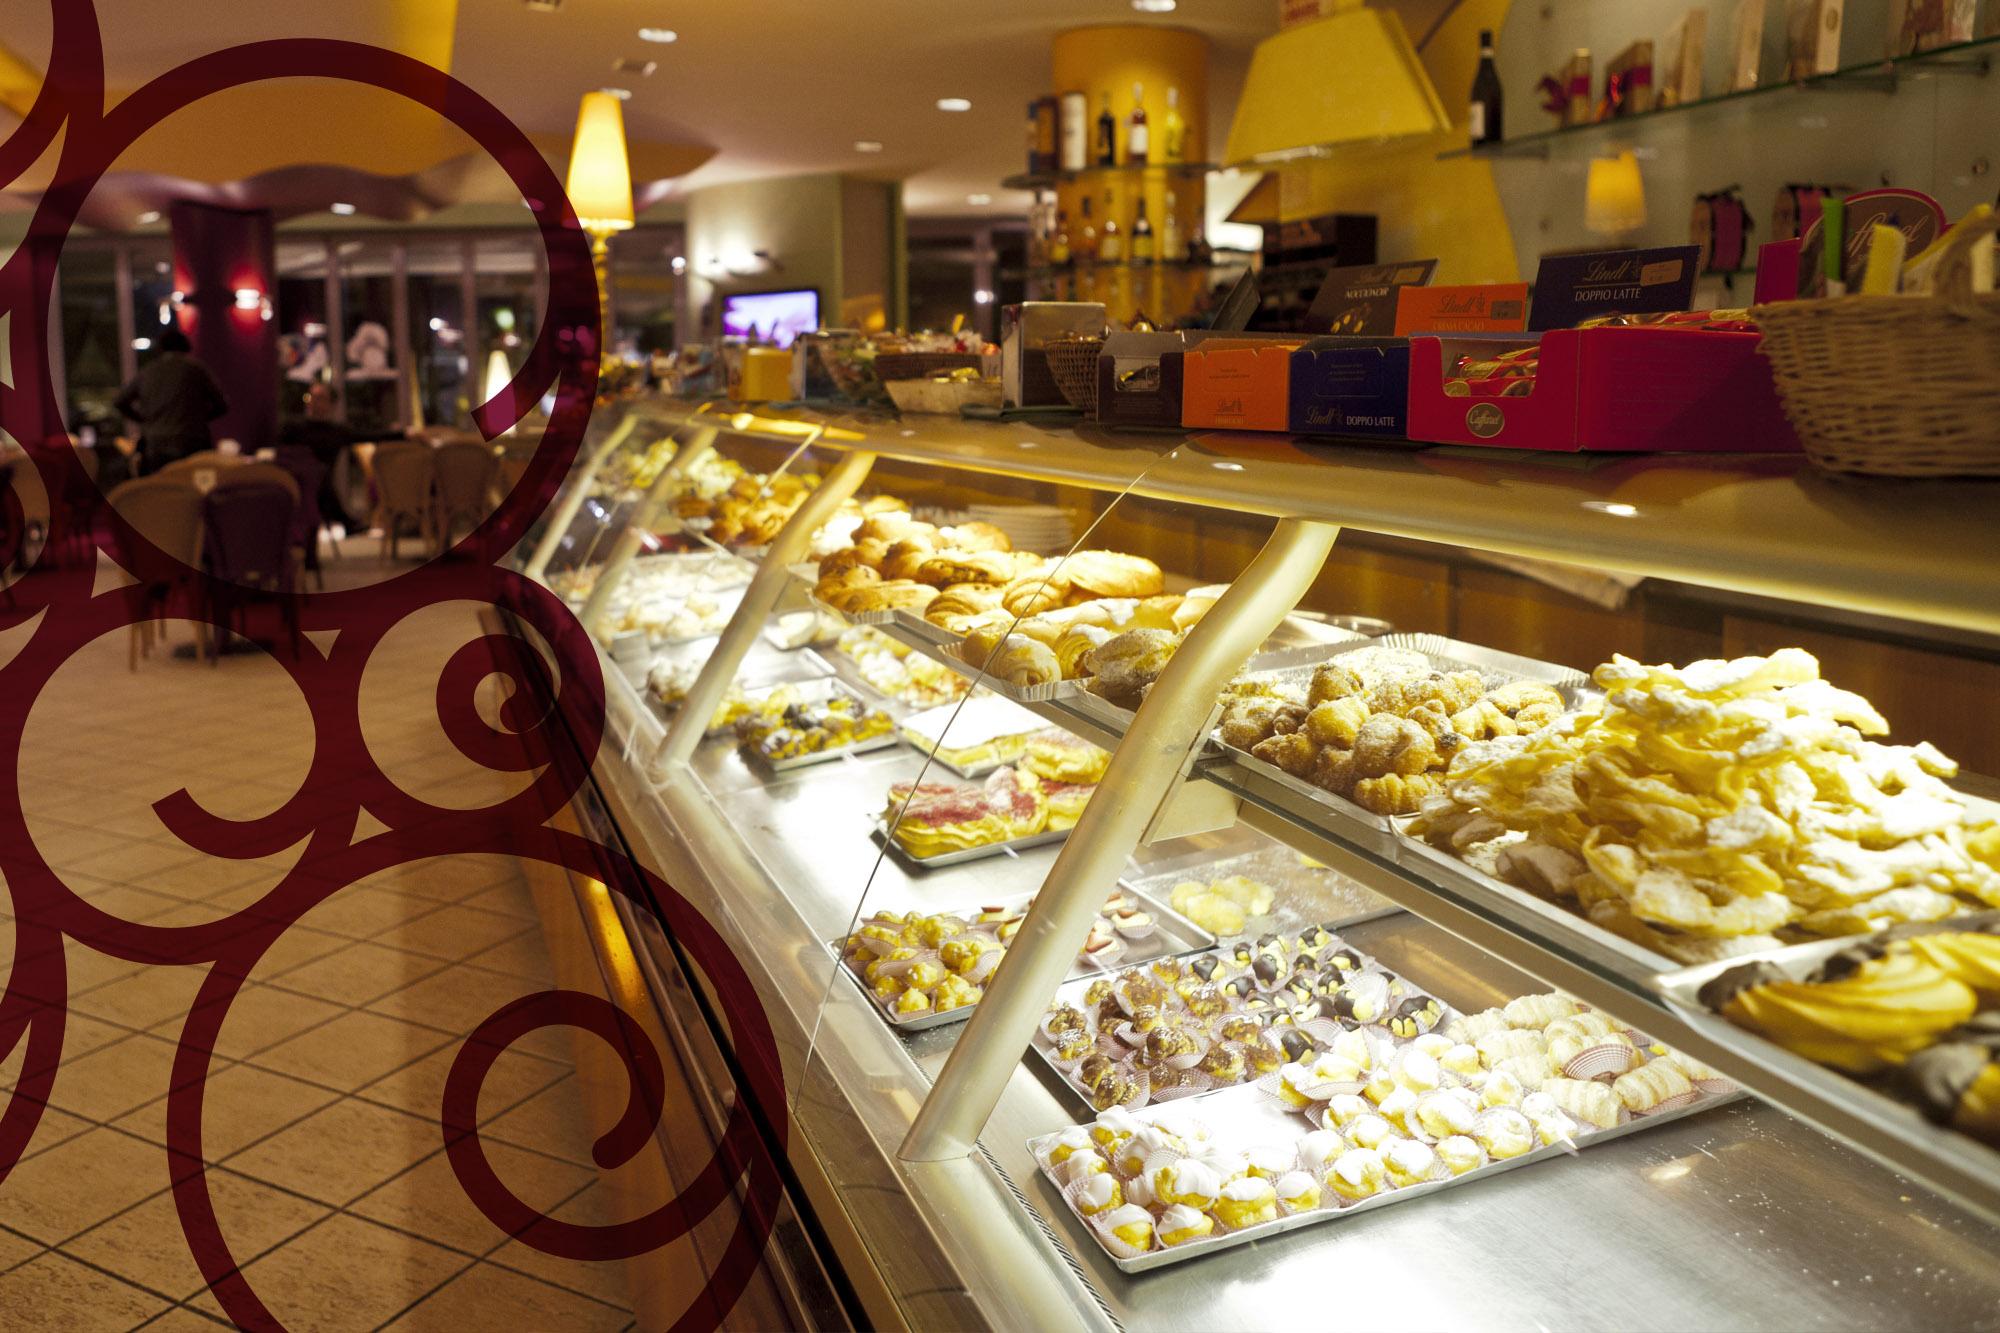 Pasticceria e caffetteria slide